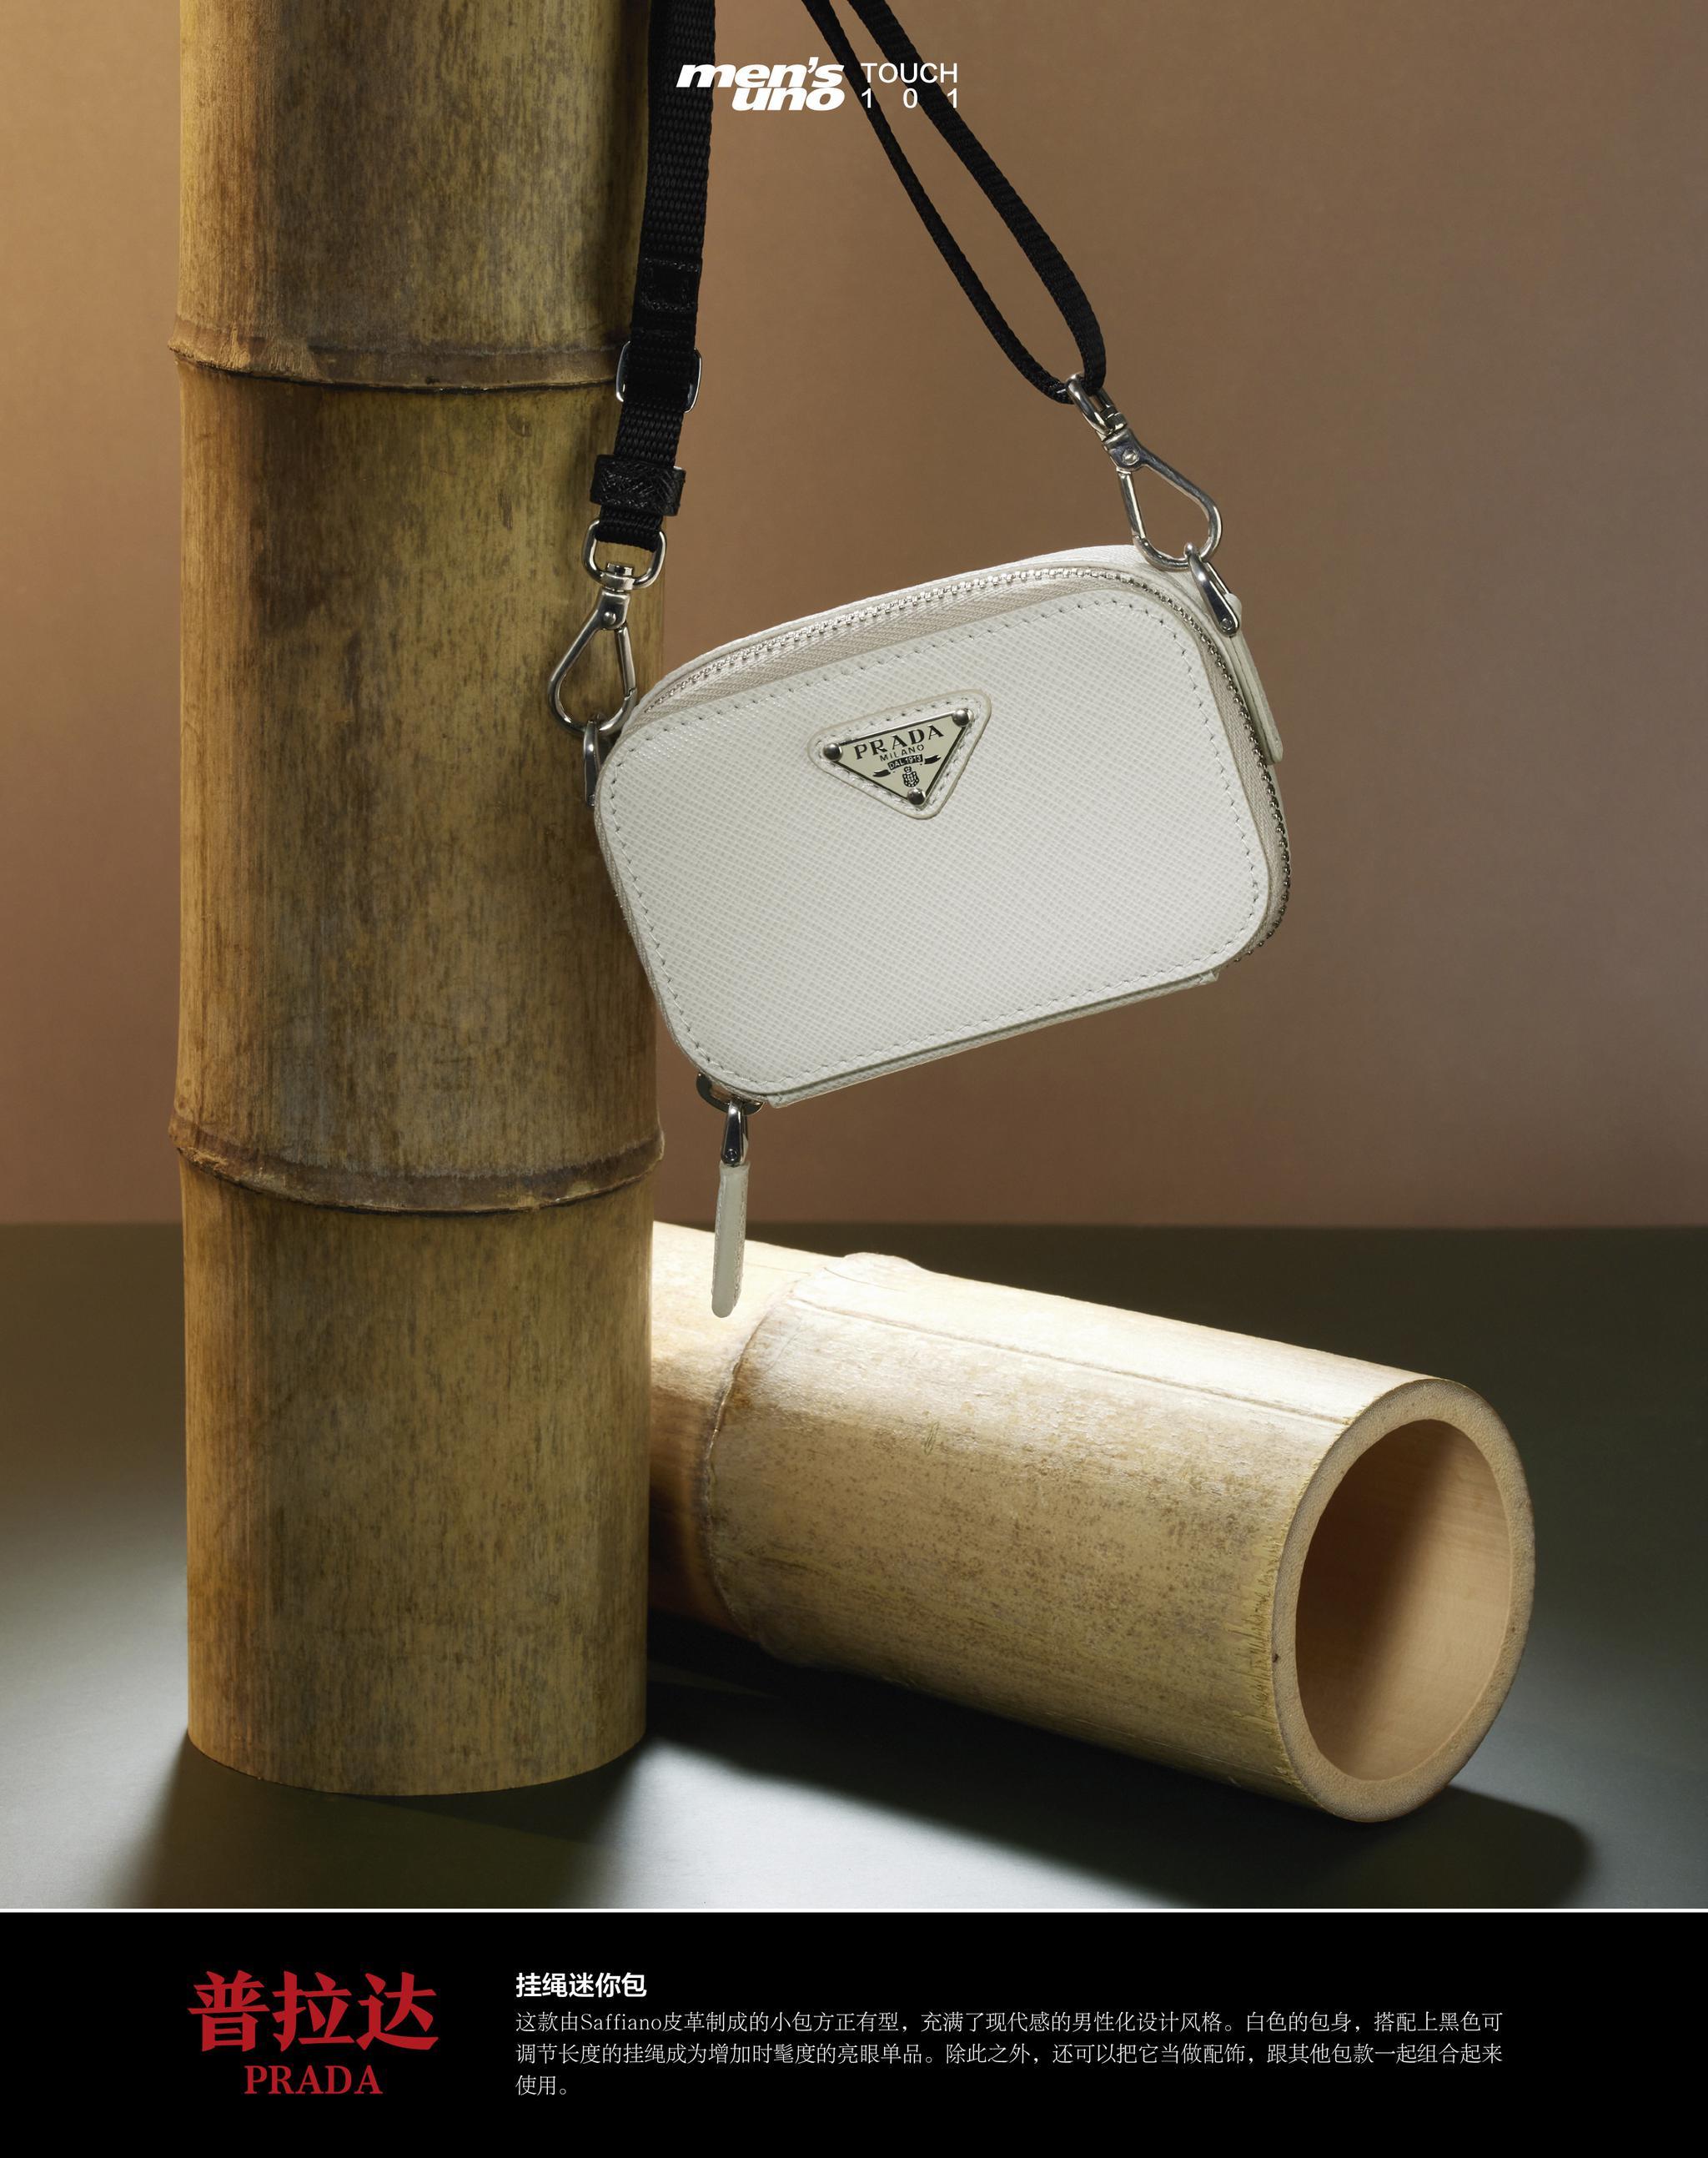 Prada这款由Saffiano皮革制成的小包方正有型……